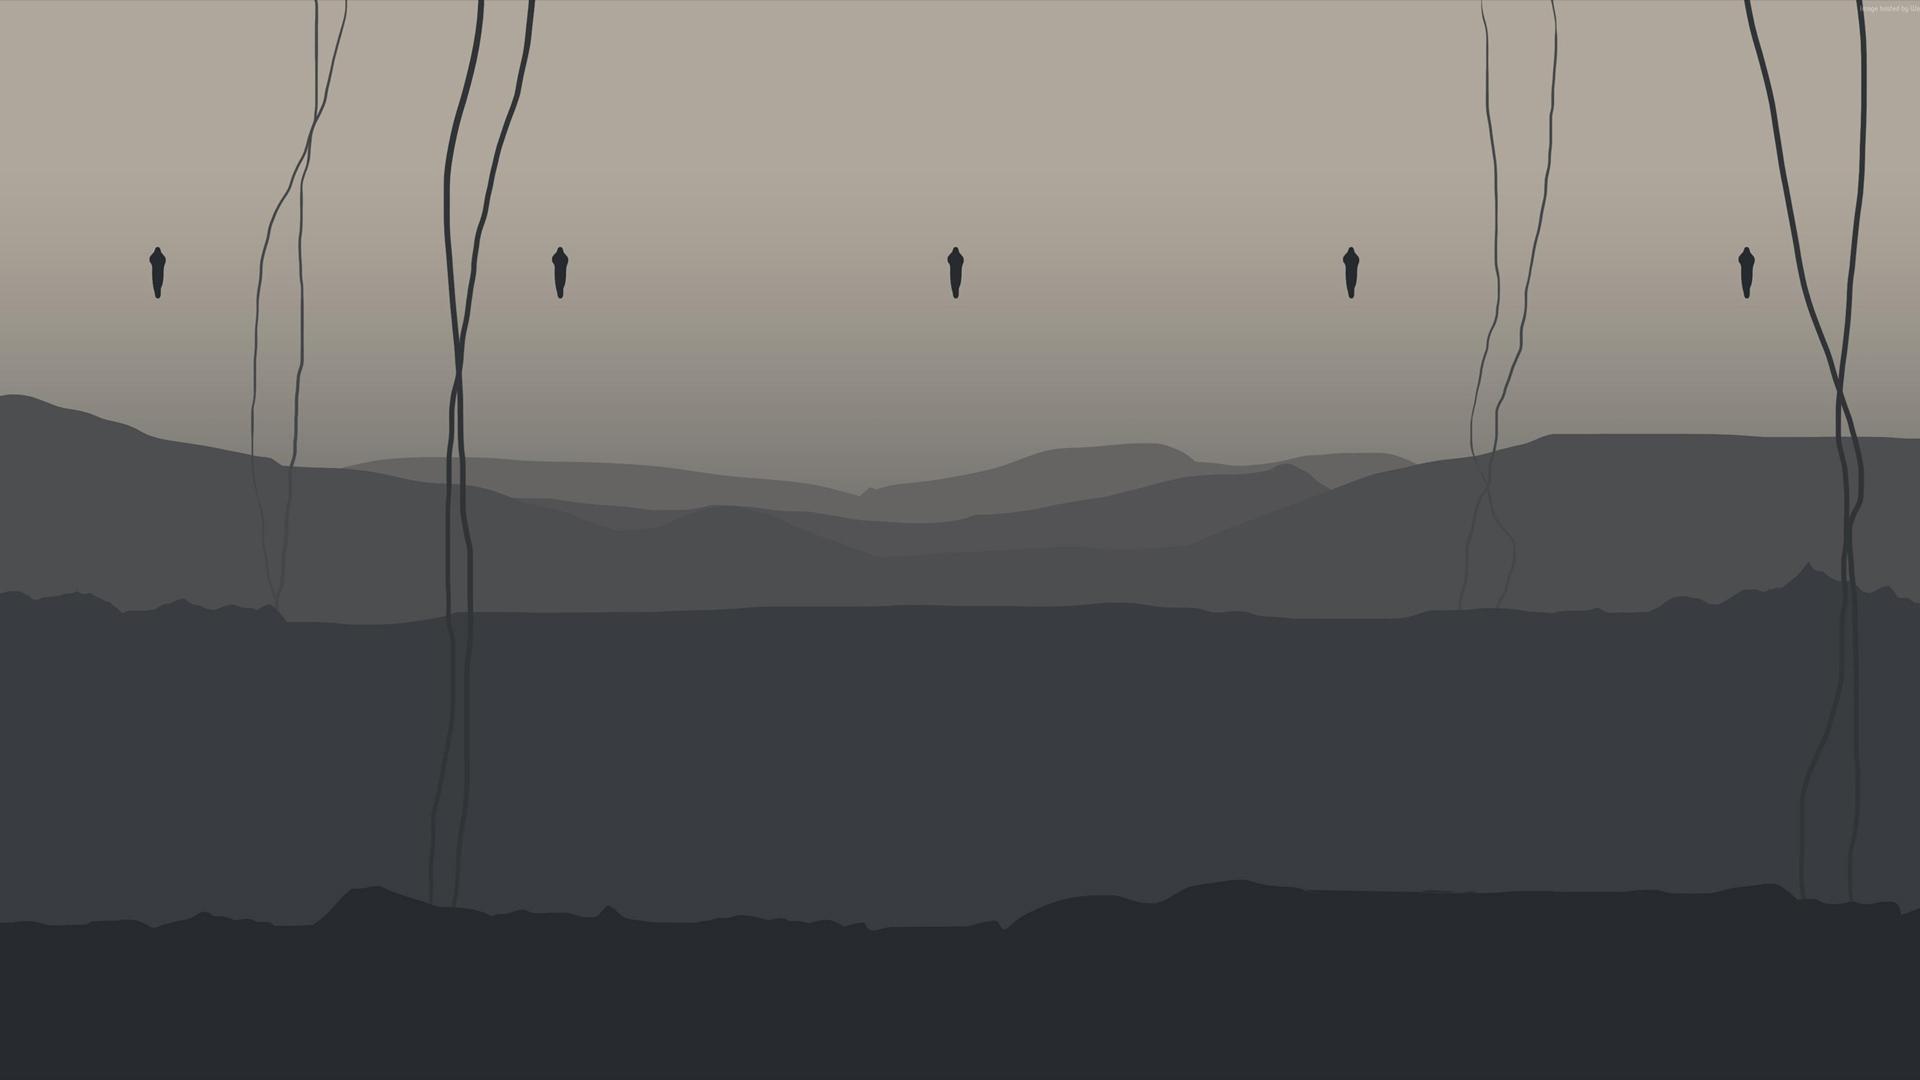 Anomalie na horyzoncie w Death Stranding. Tapeta na pulpit Death Stranding